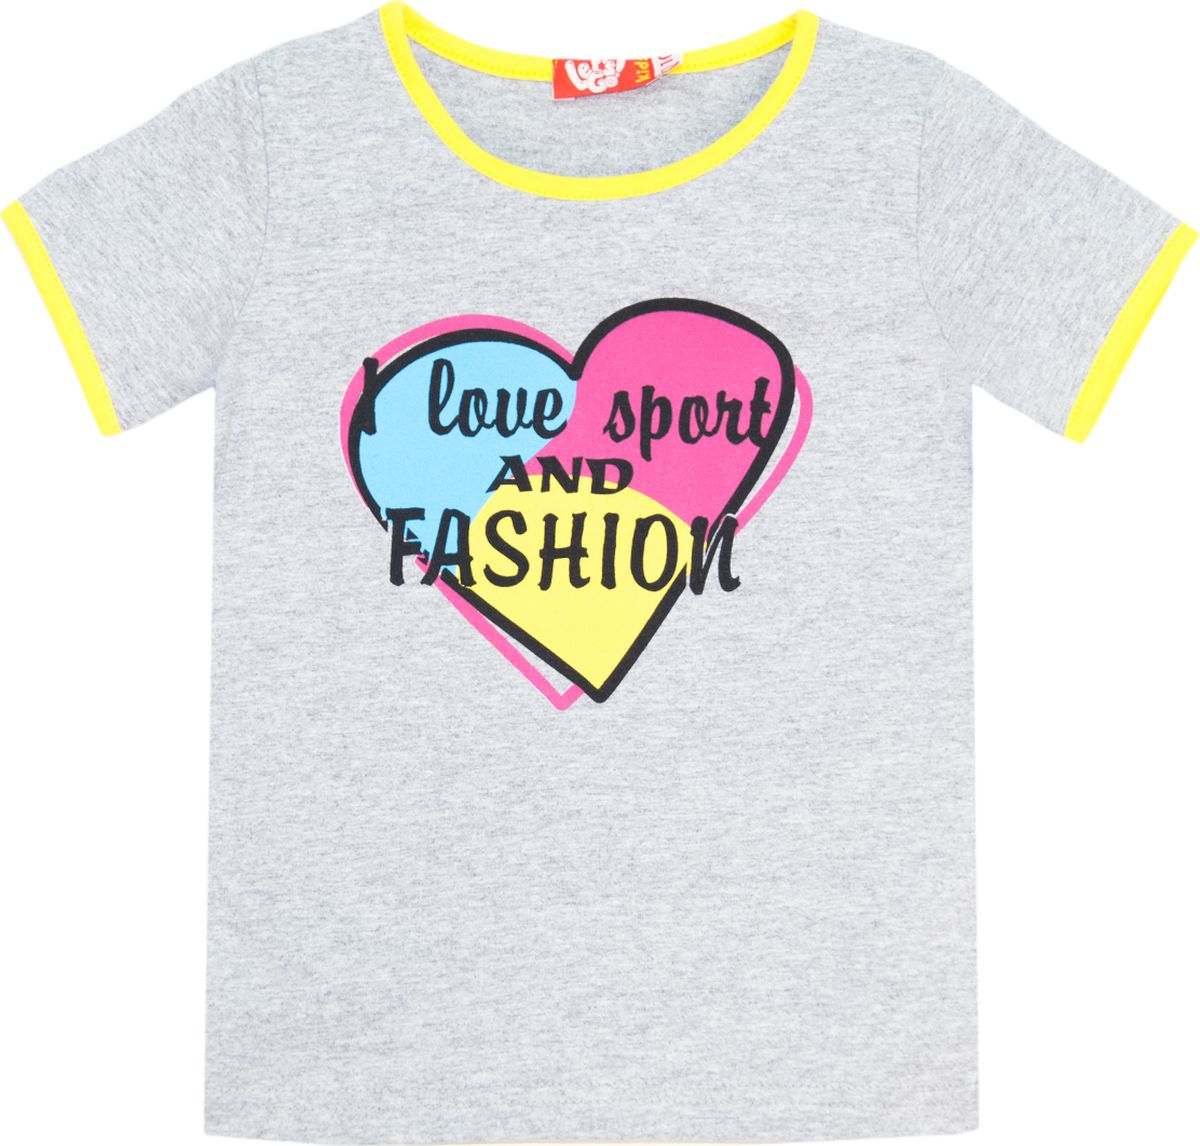 Футболка для девочки Let's Go, цвет: серый. 5146. Размер 98 спортивный костюм для девочки let s go цвет фиолетовый 11114 размер 164